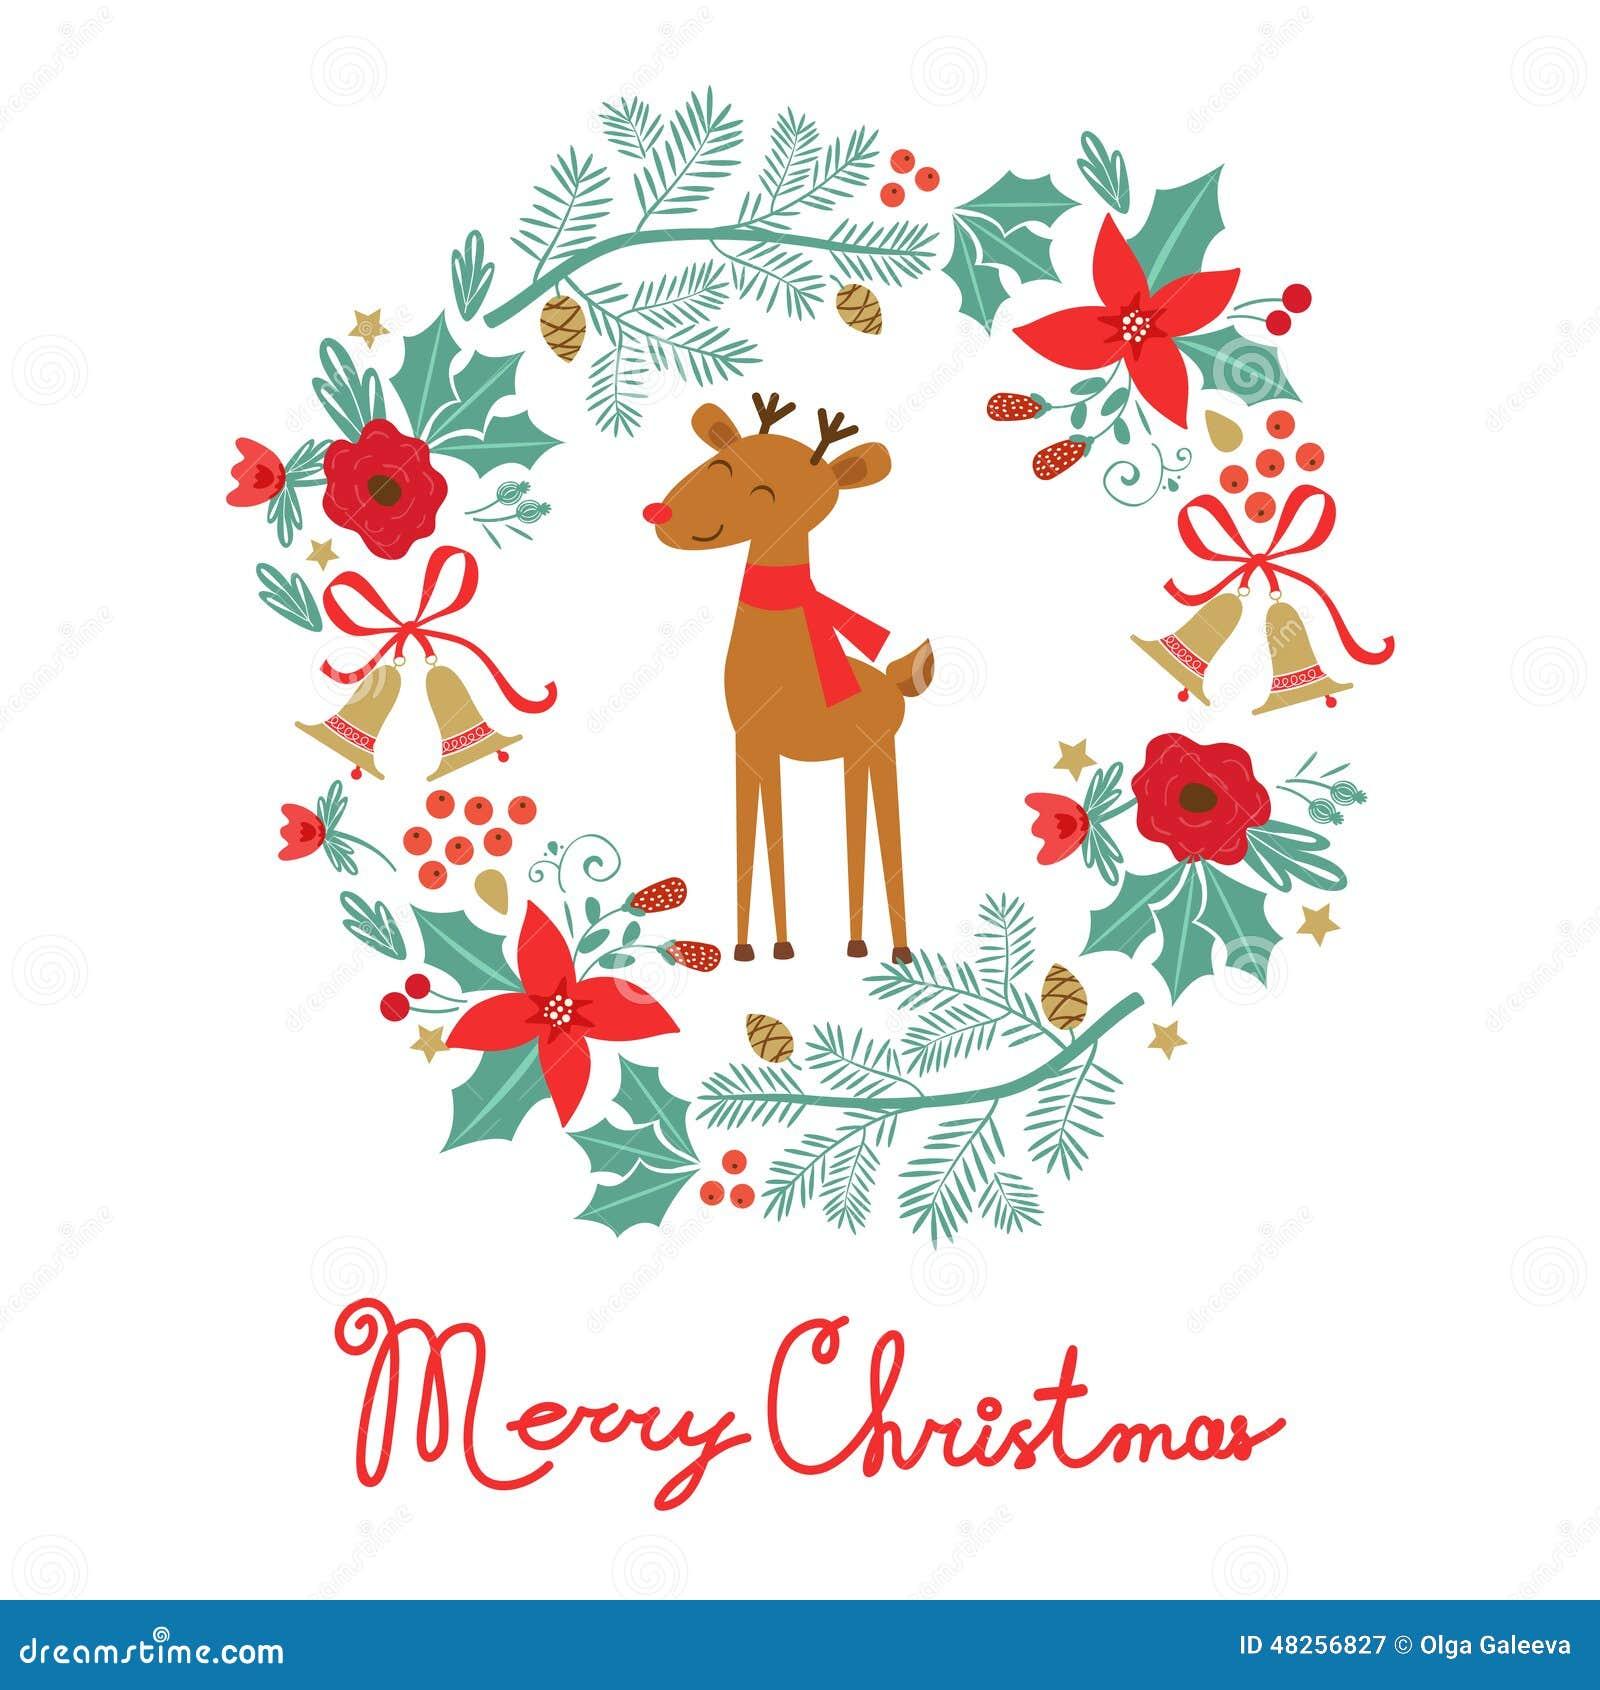 Cartao Colorido Do Feliz Natal Ilustracao Do Vetor Ilustracao De